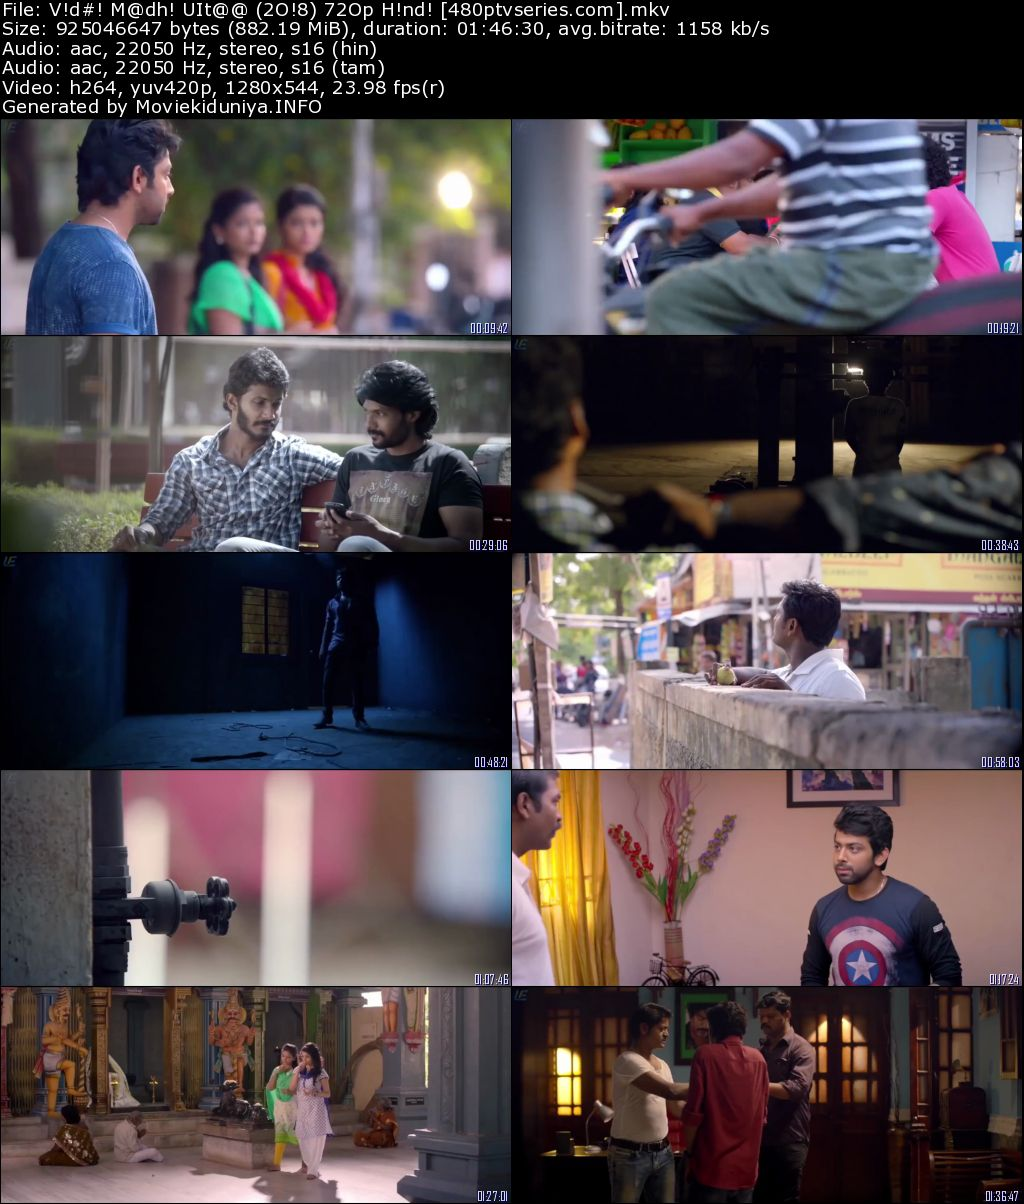 Vidhi Madhi Ultaa (2018) 850Mb Full Hindi Dual Audio Movie Download 720p HDRip Free Watch Online Full Movie Download Worldfree4u 9xmovies